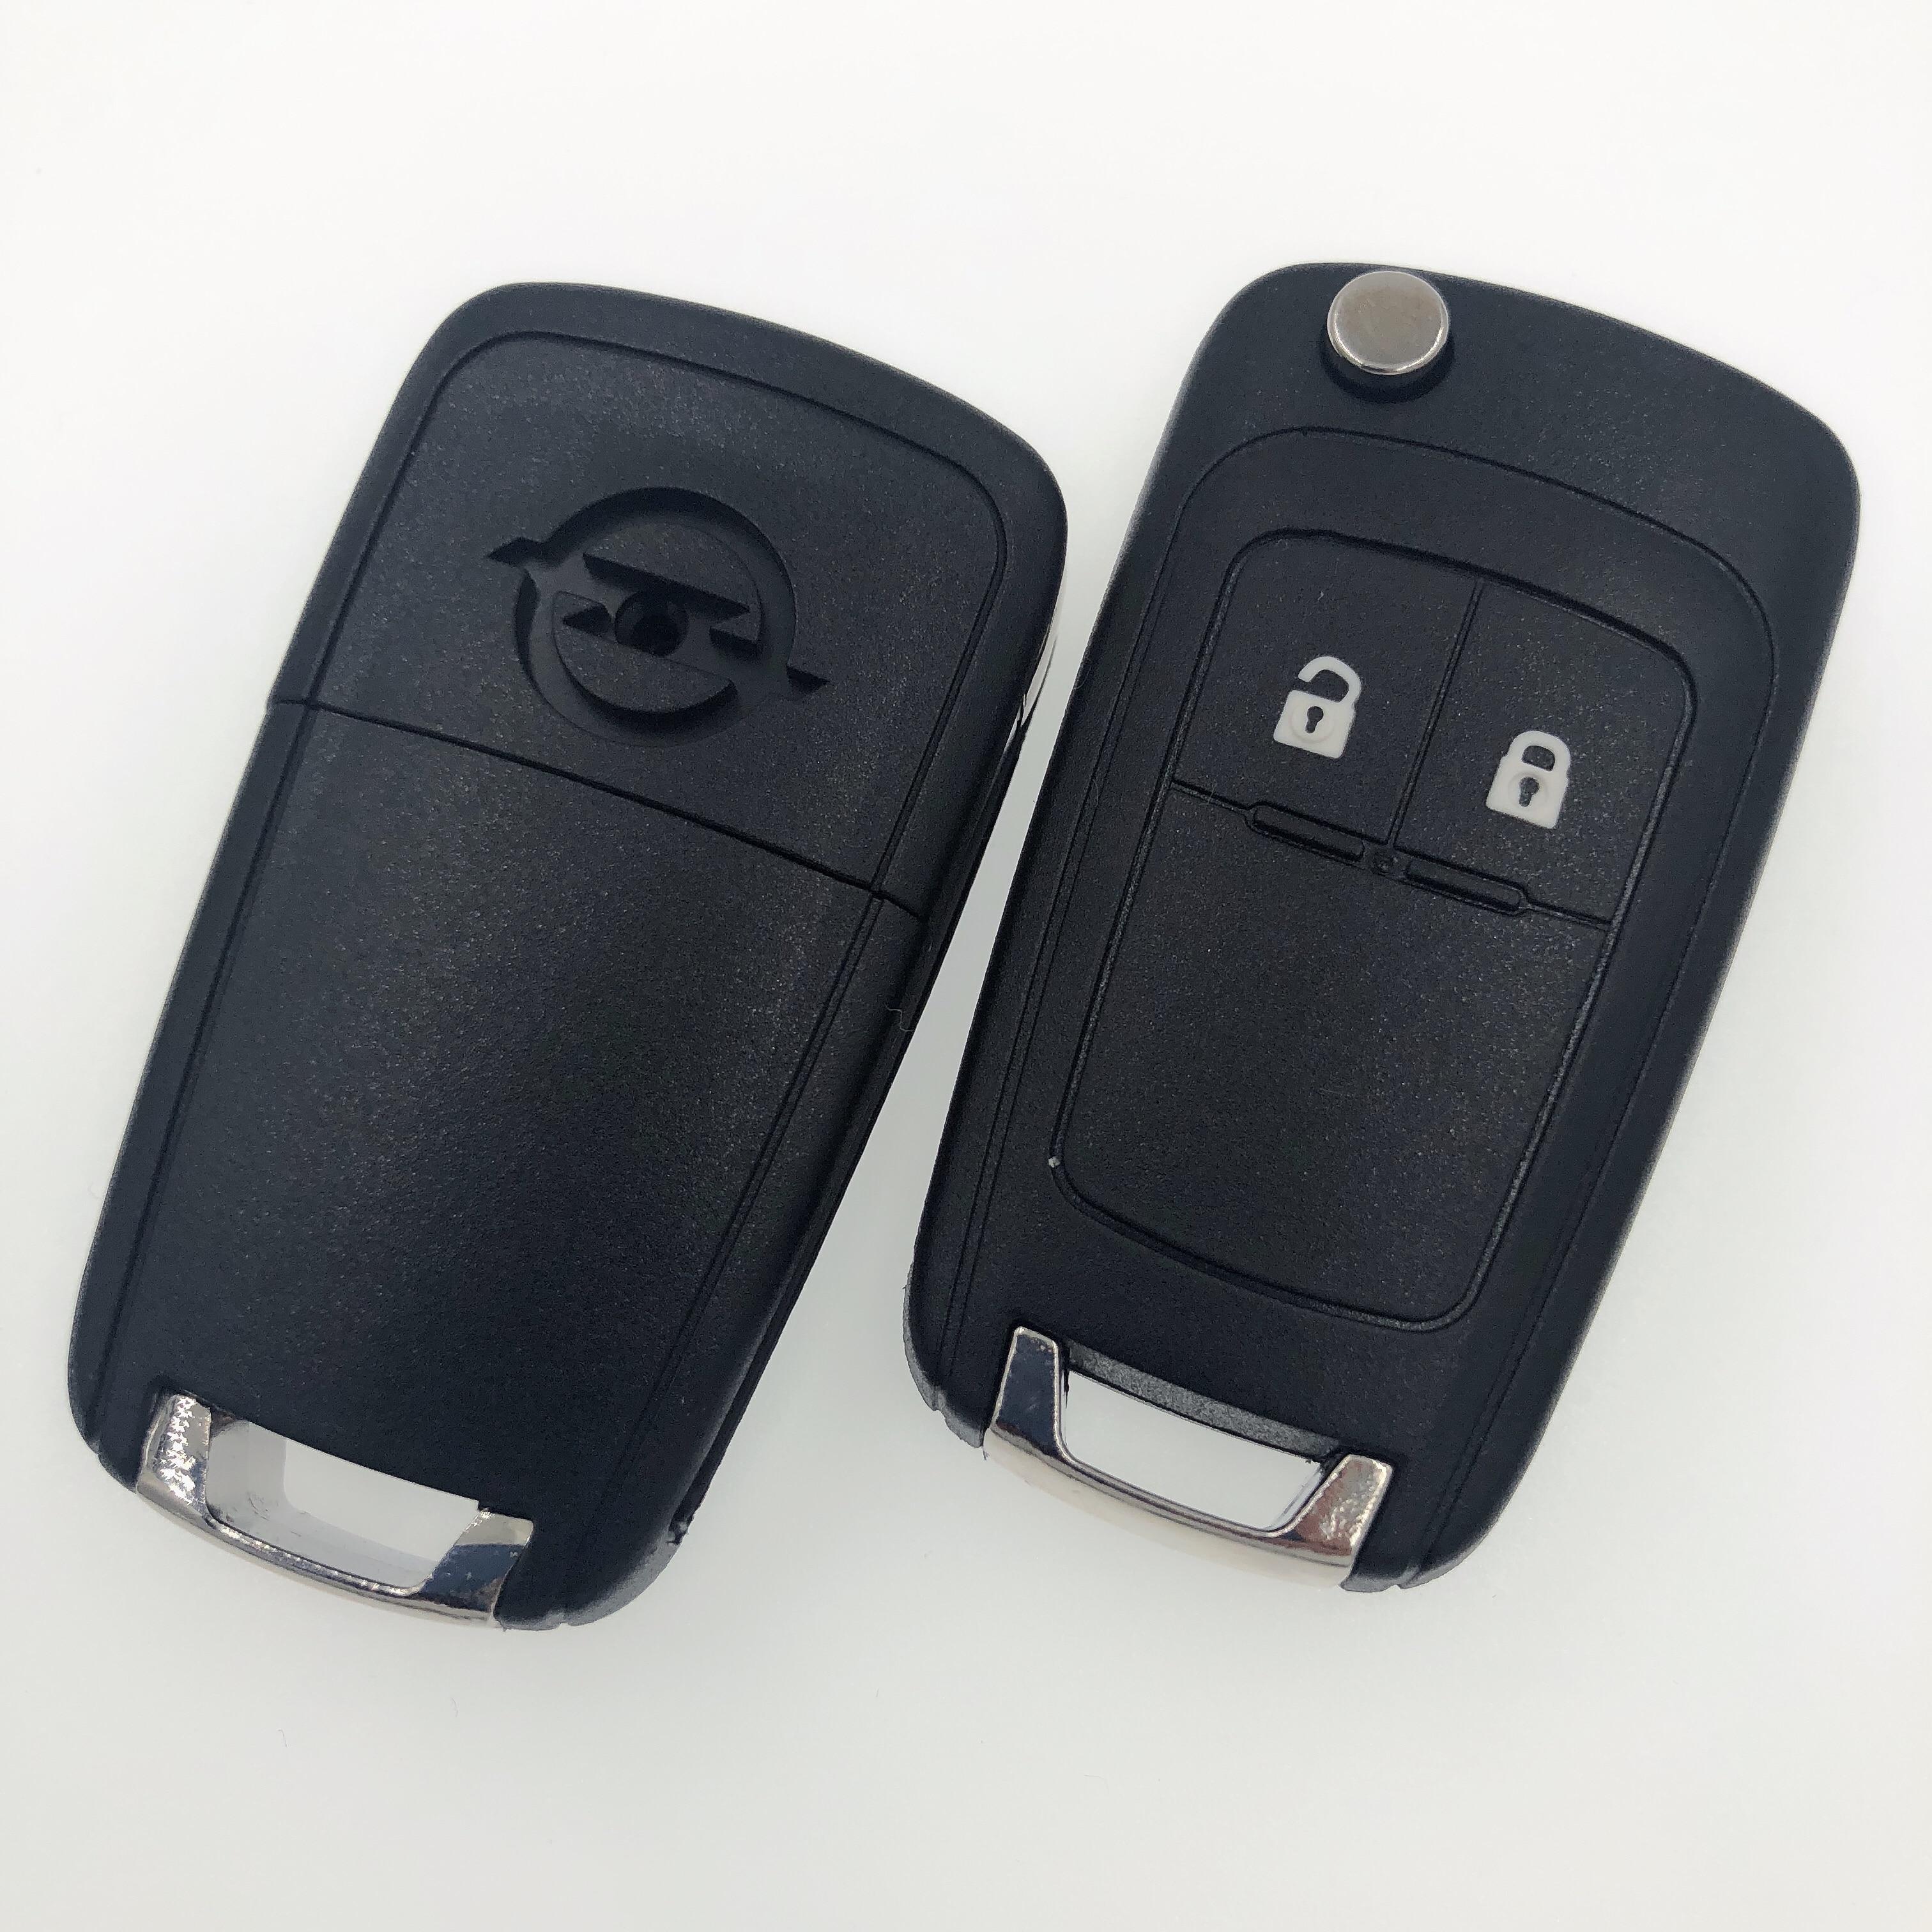 2 кнопки дистанционный ключ заготовка для OPEL Воксхолл Зафира знаки отличия Астра Холден флип-ключ для автомобиля Shell Обложка Брелок с винт